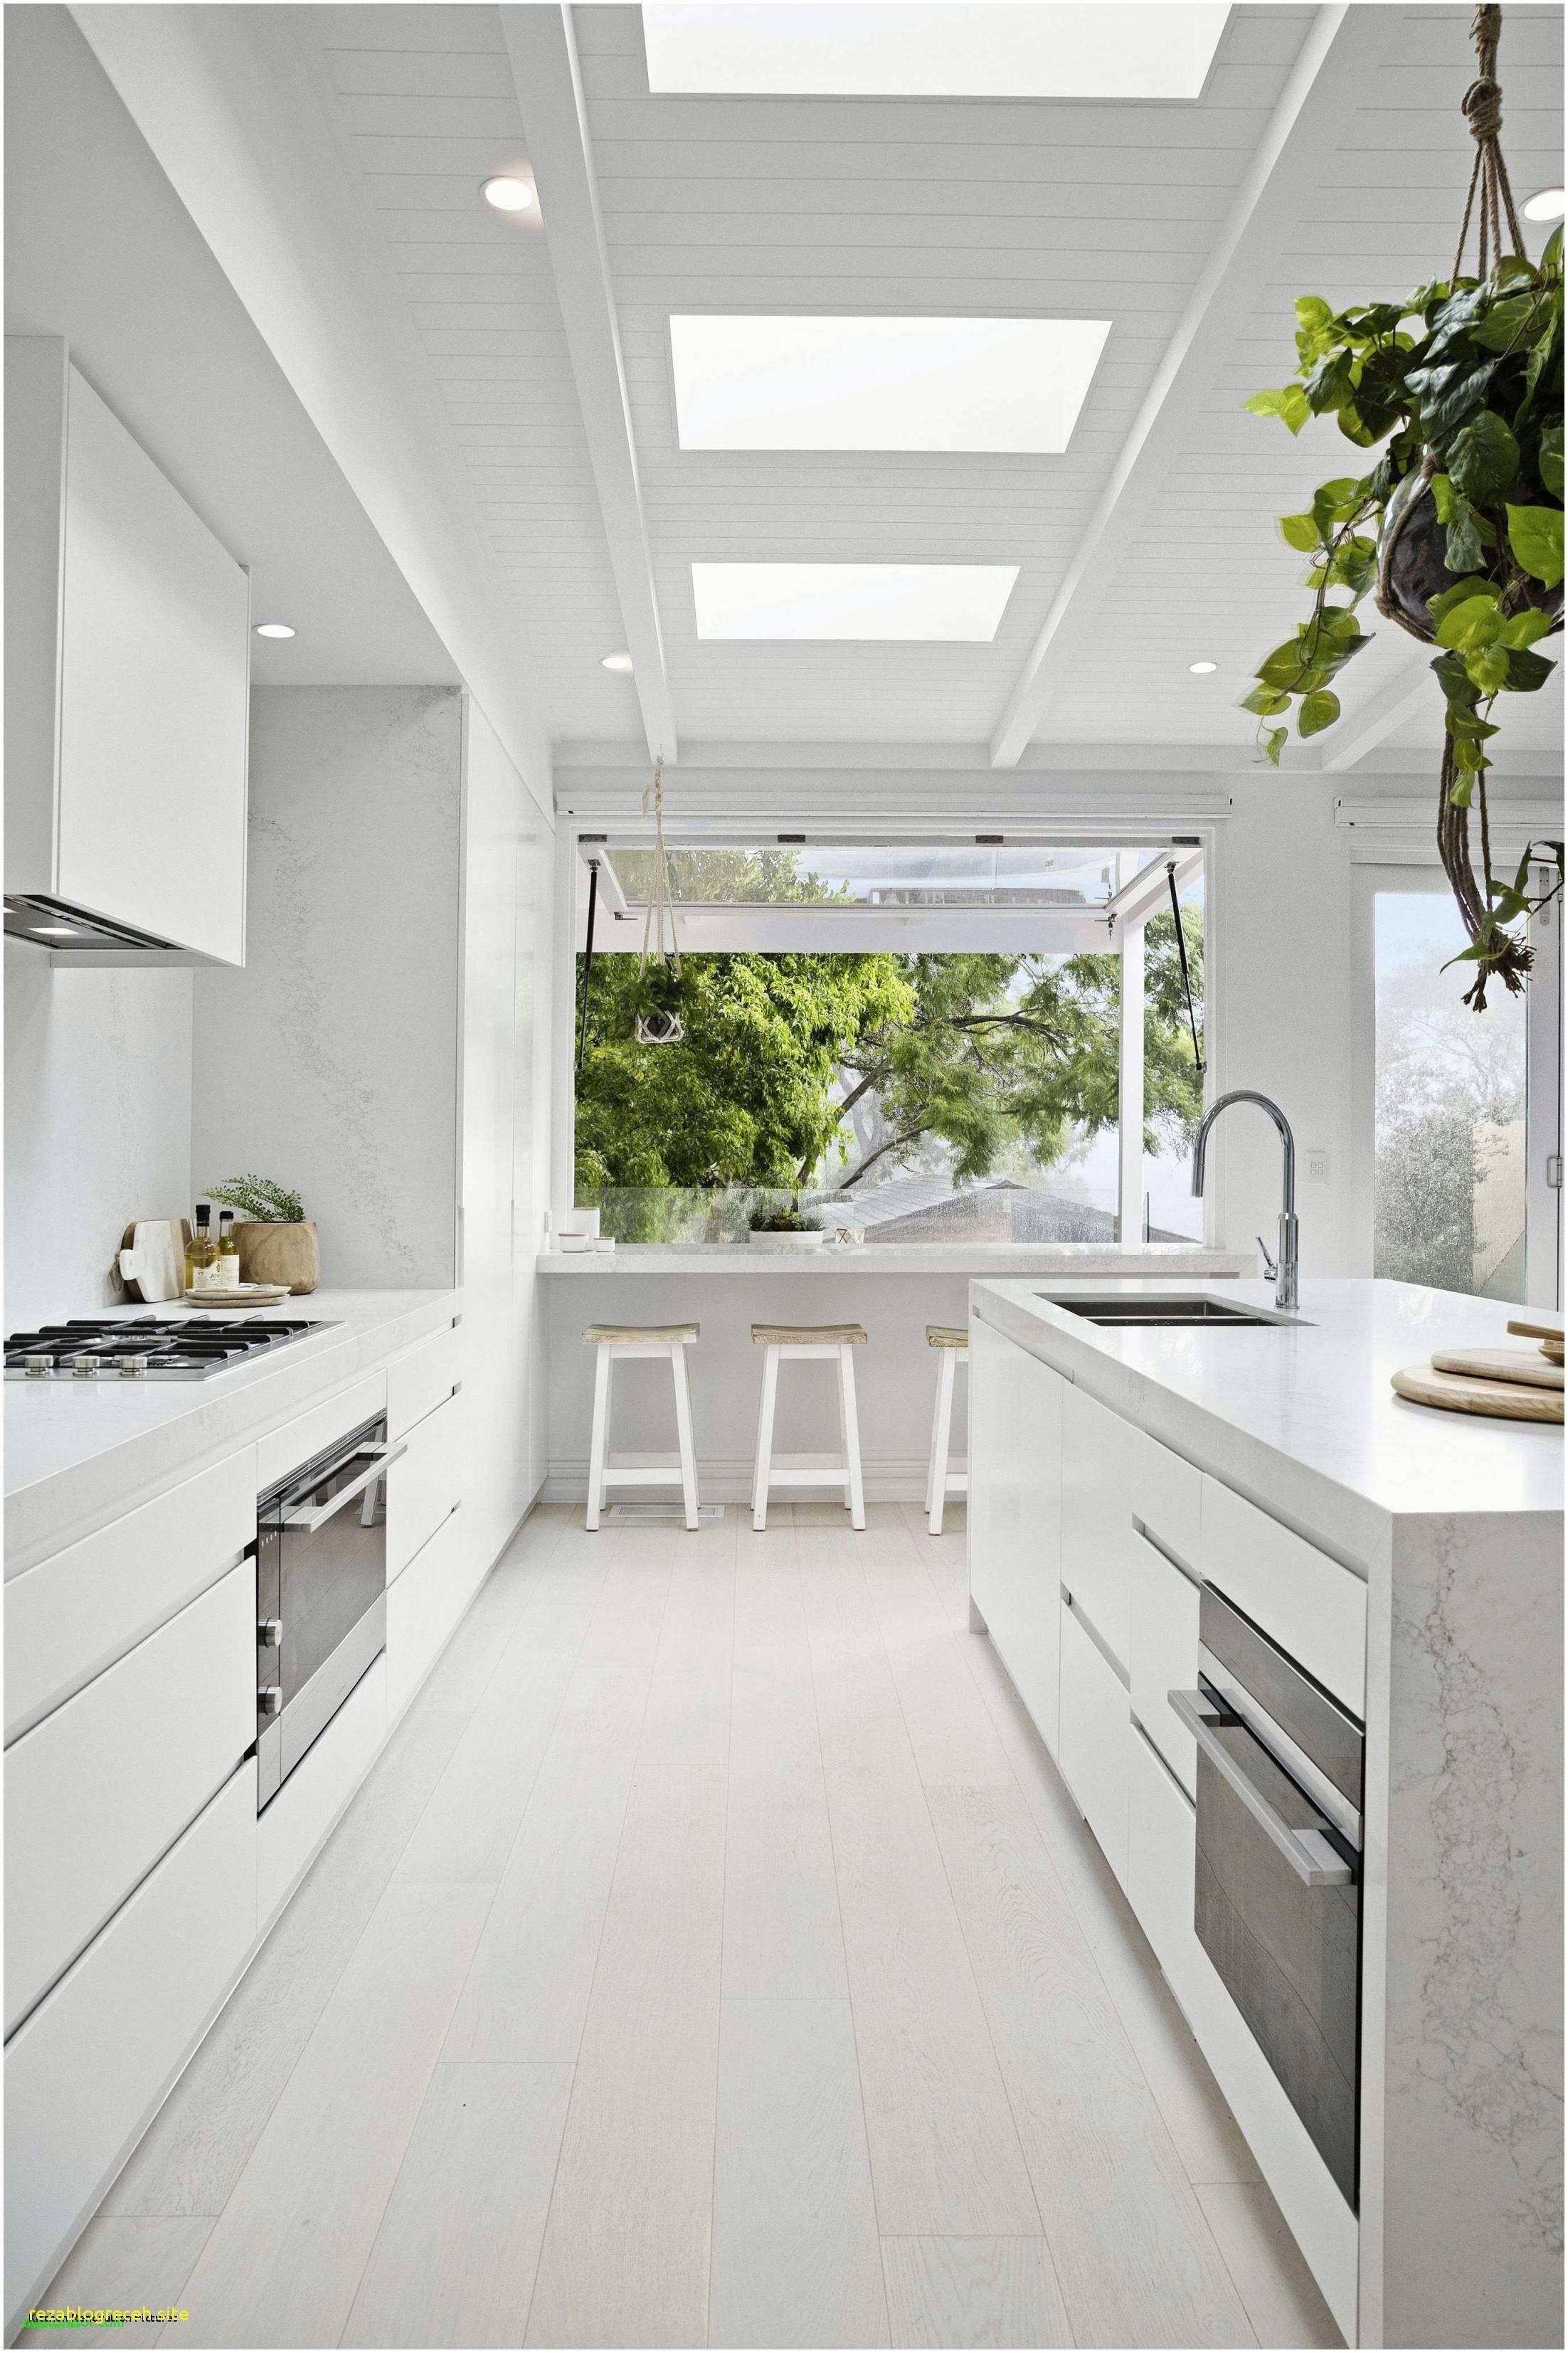 small kitchen design images elegant contemporary kitchens designs of small kitchen design images